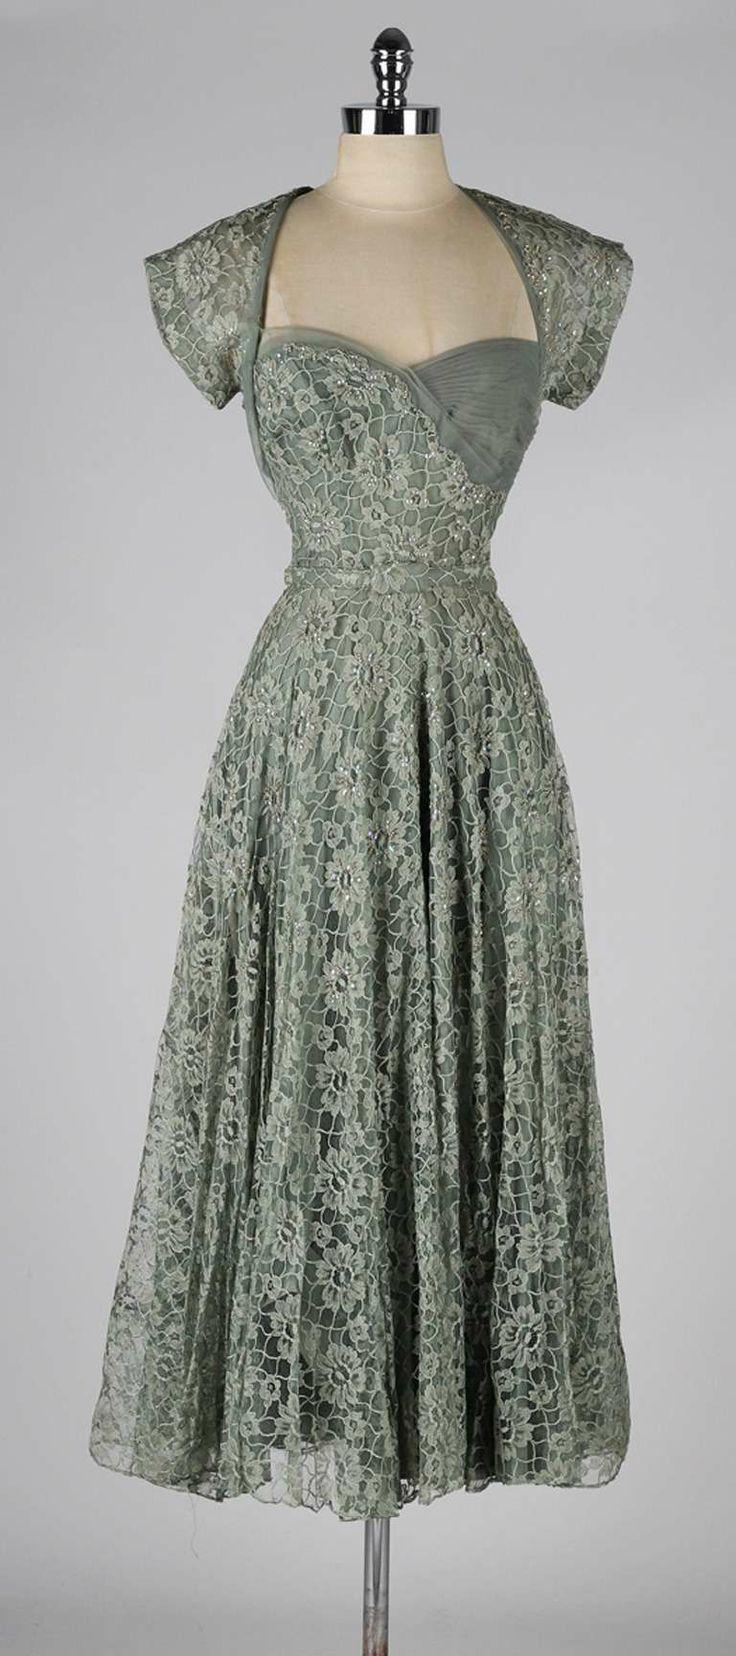 082e438272 Vintage 1940 s Sage Green Lace Cocktail Dress